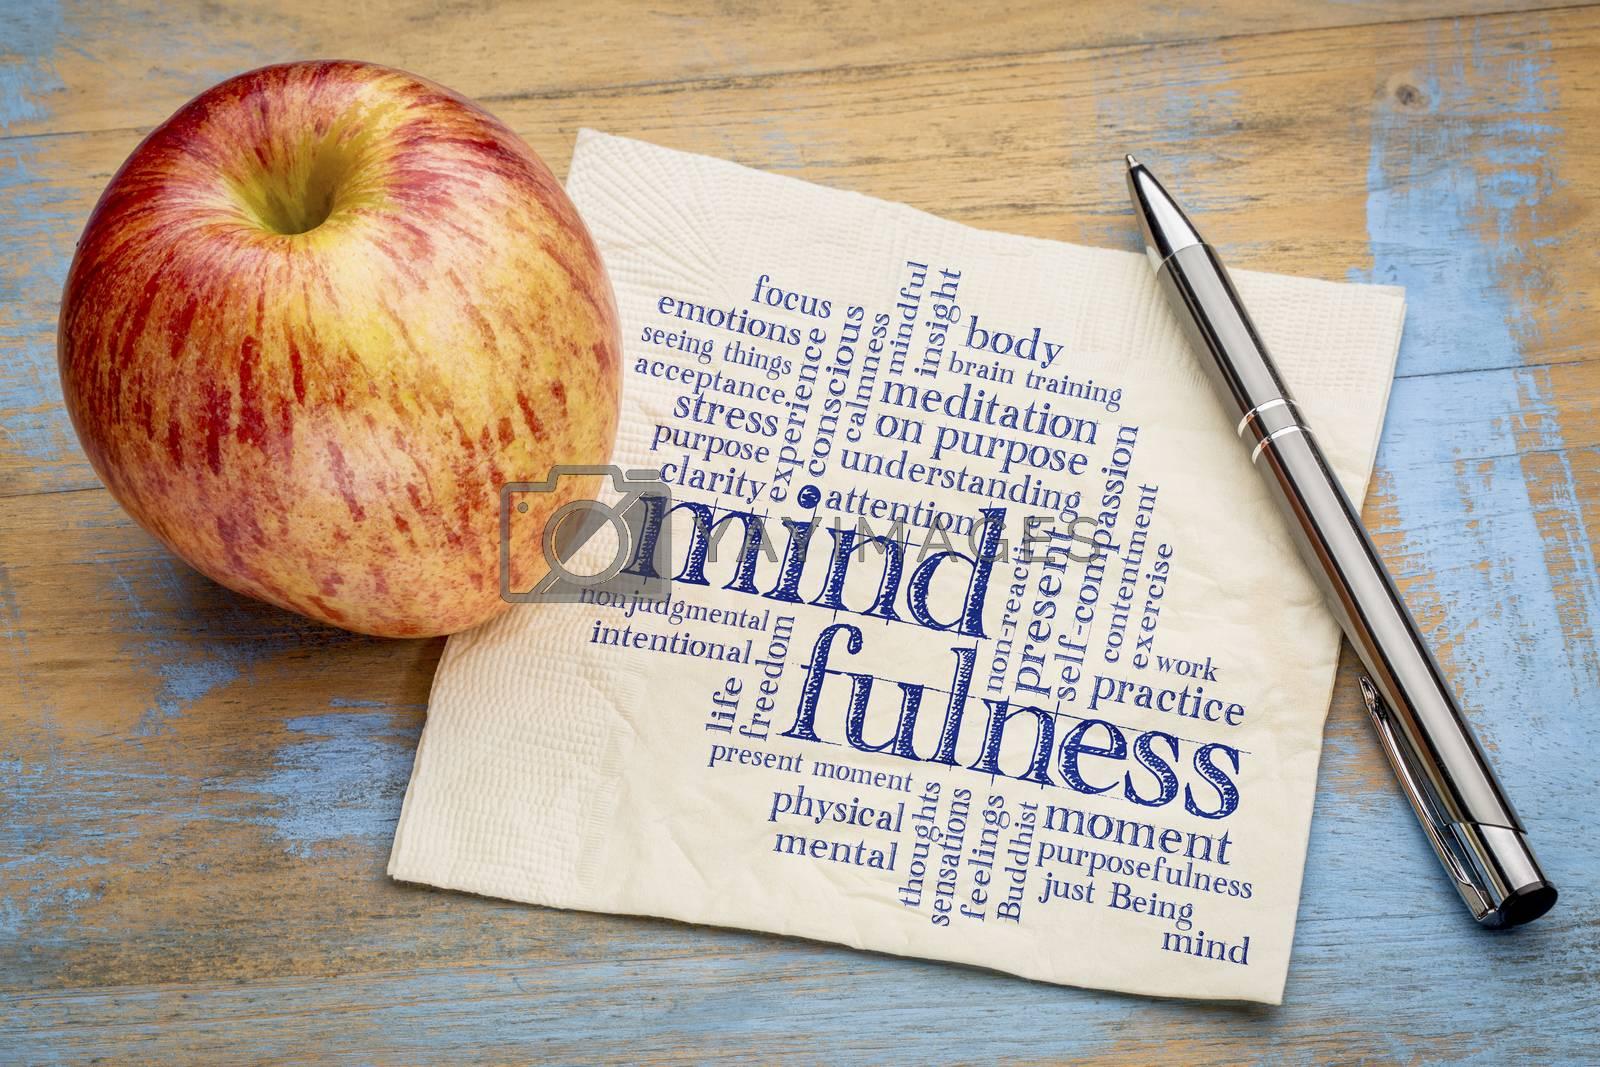 mindfulness word cloud on a napkin with a fresh apple